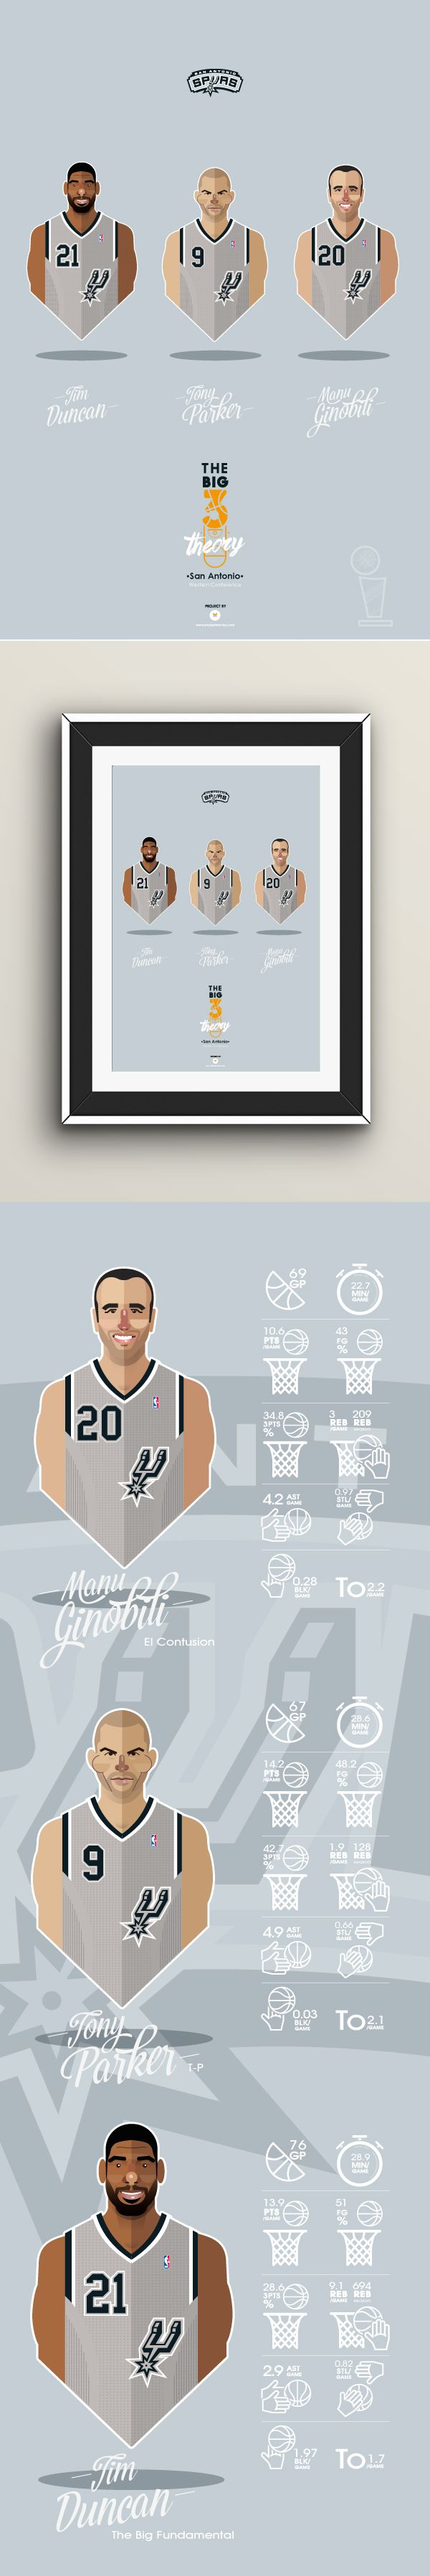 216 best Graphic design / Illustration images on Pinterest | Posters ...